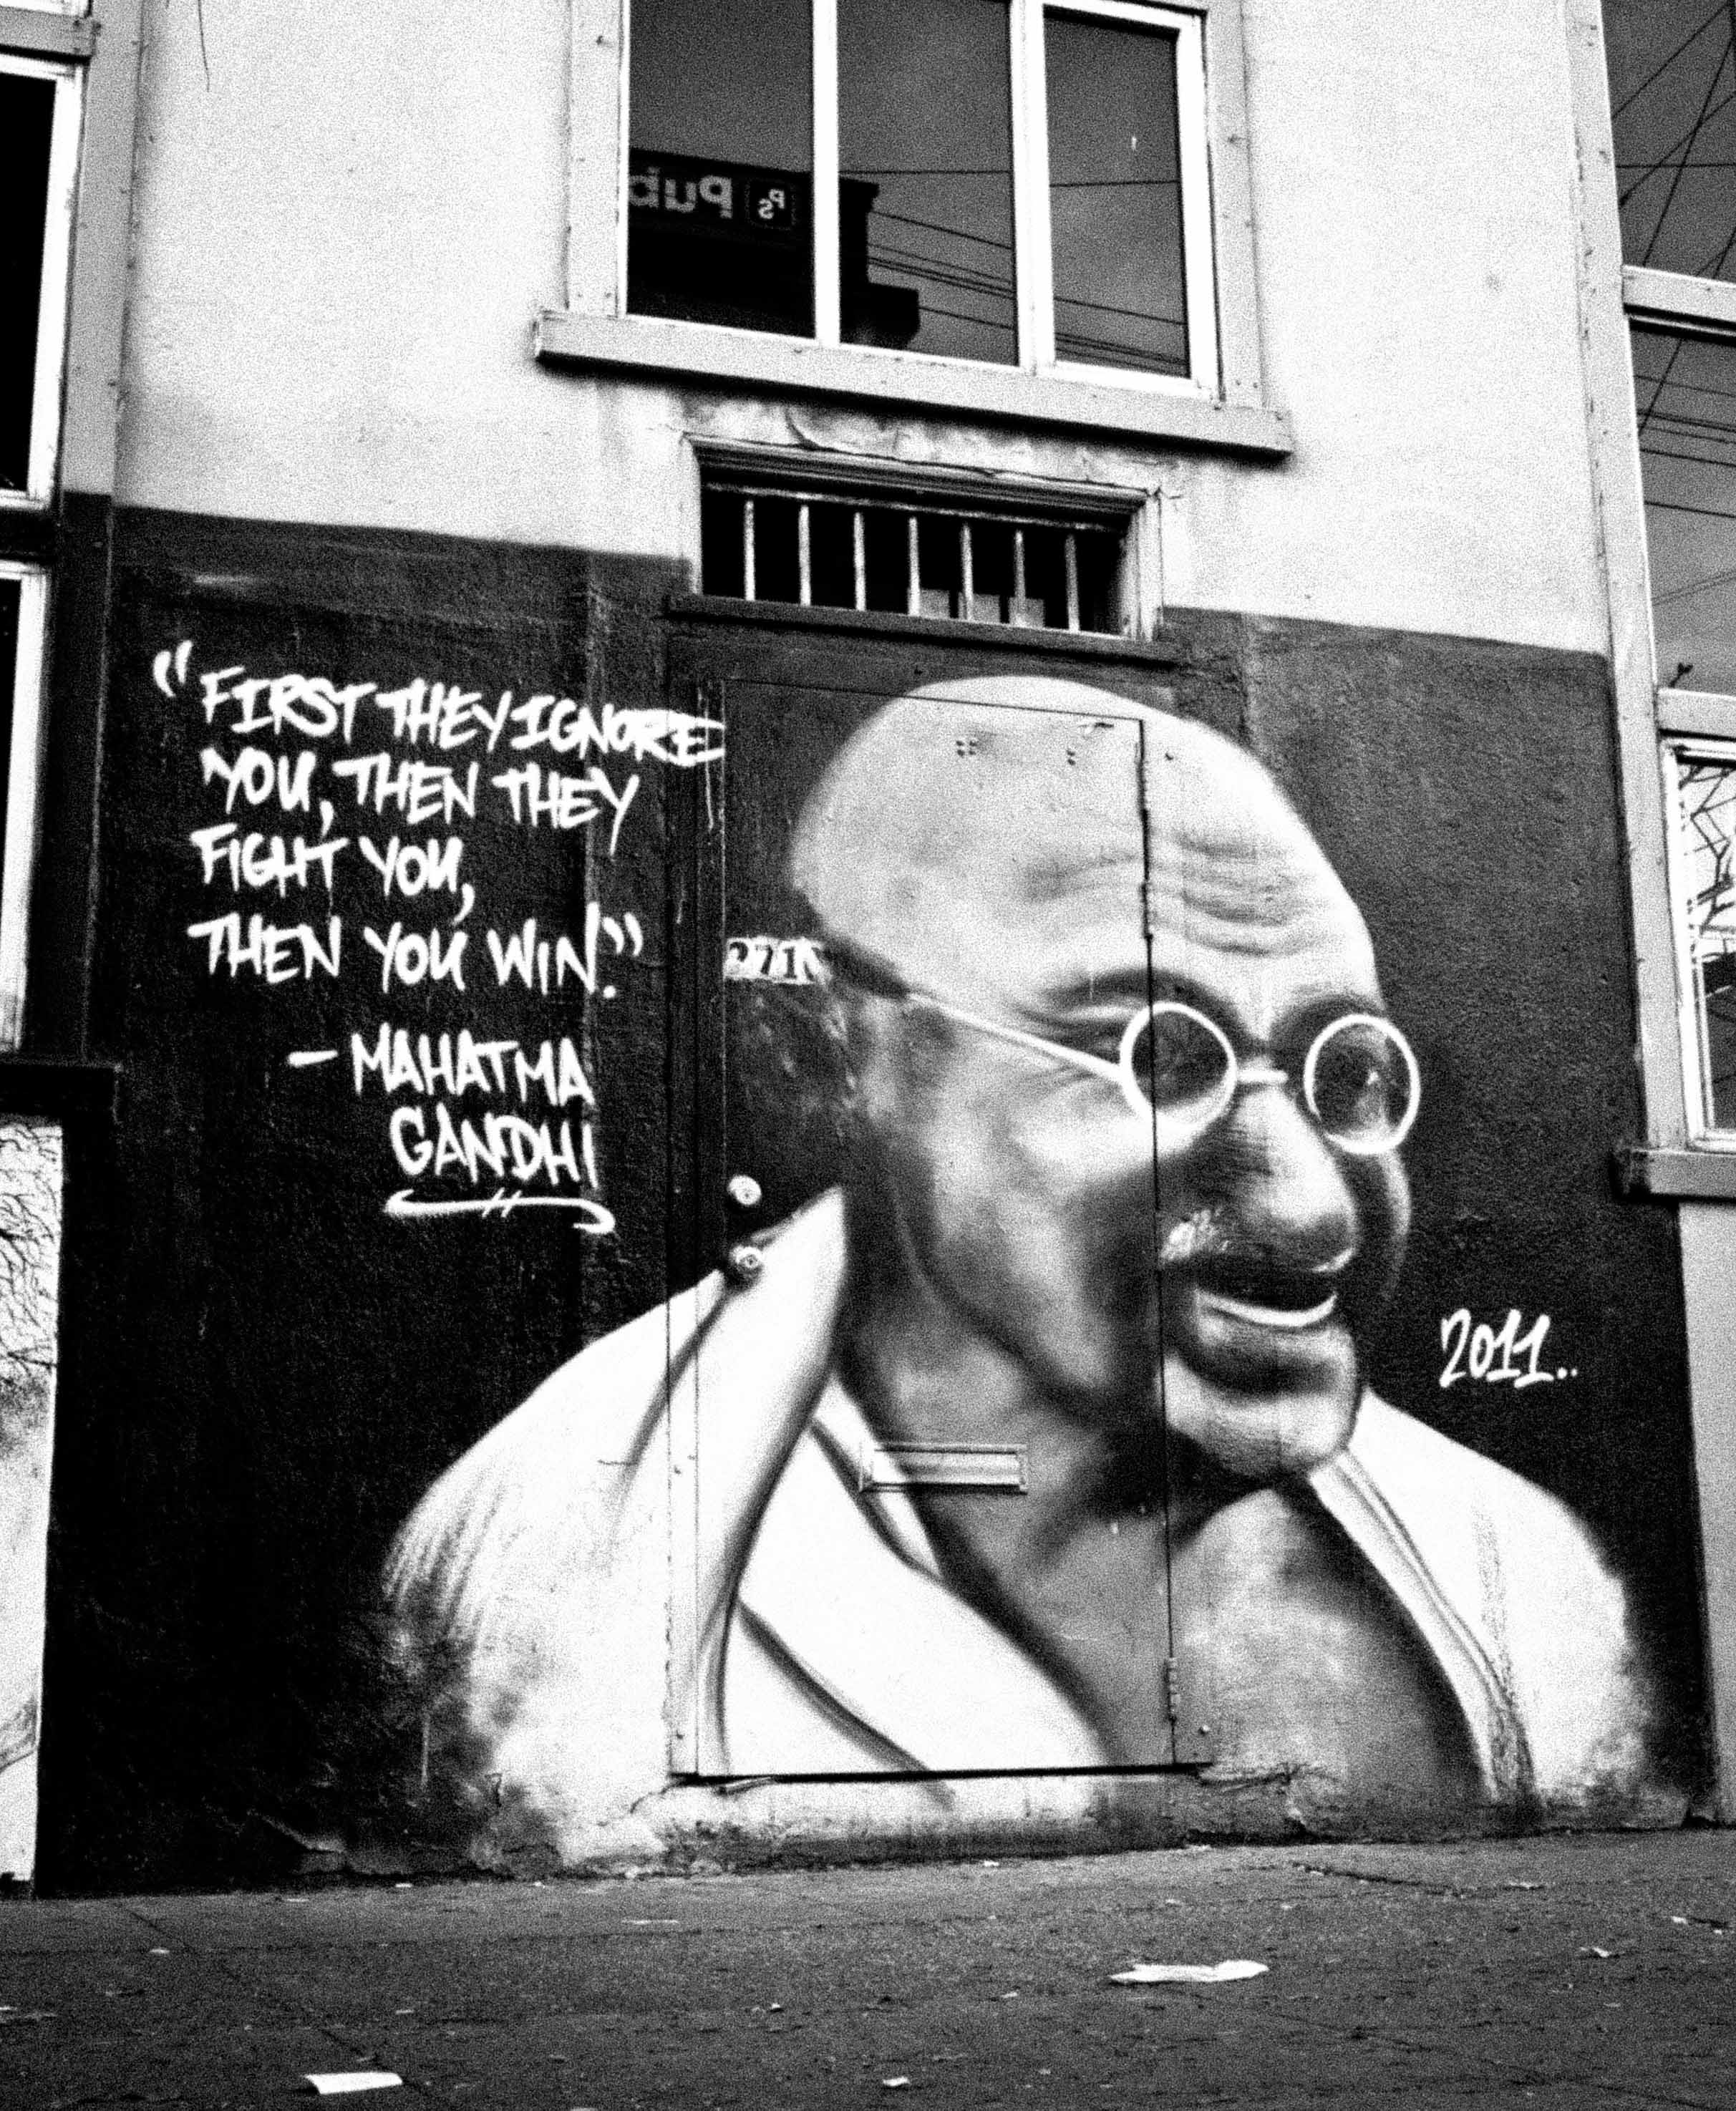 Gandhi - SOMA, 2011.